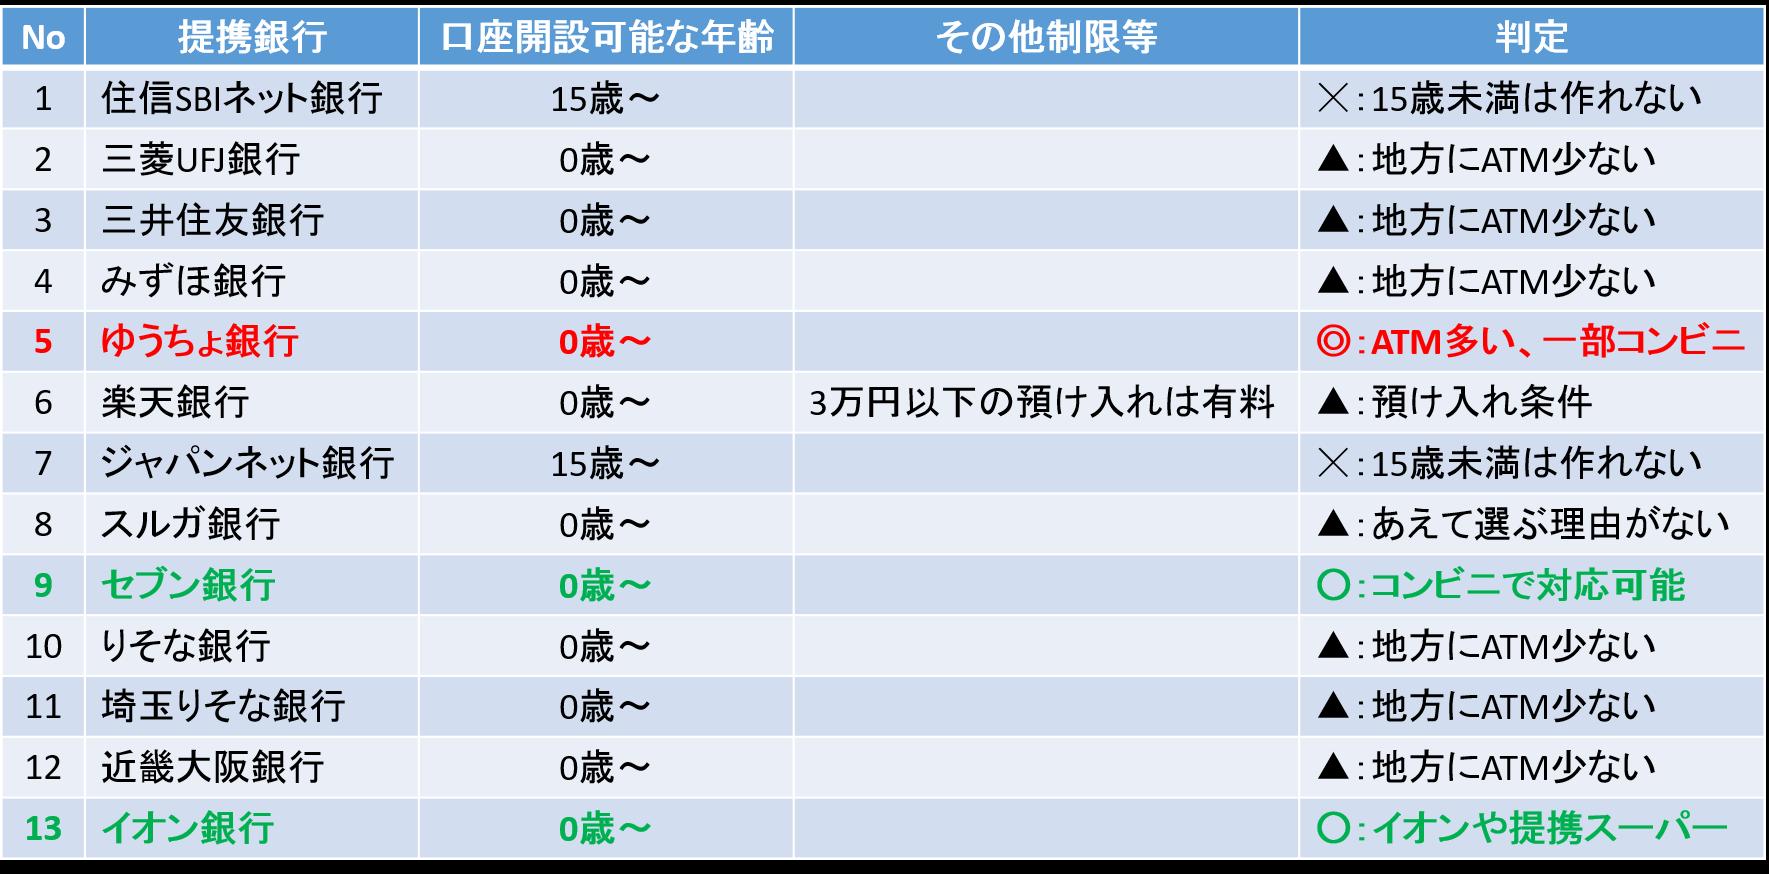 SBI証券の即時入金サービス対応銀行の比較表